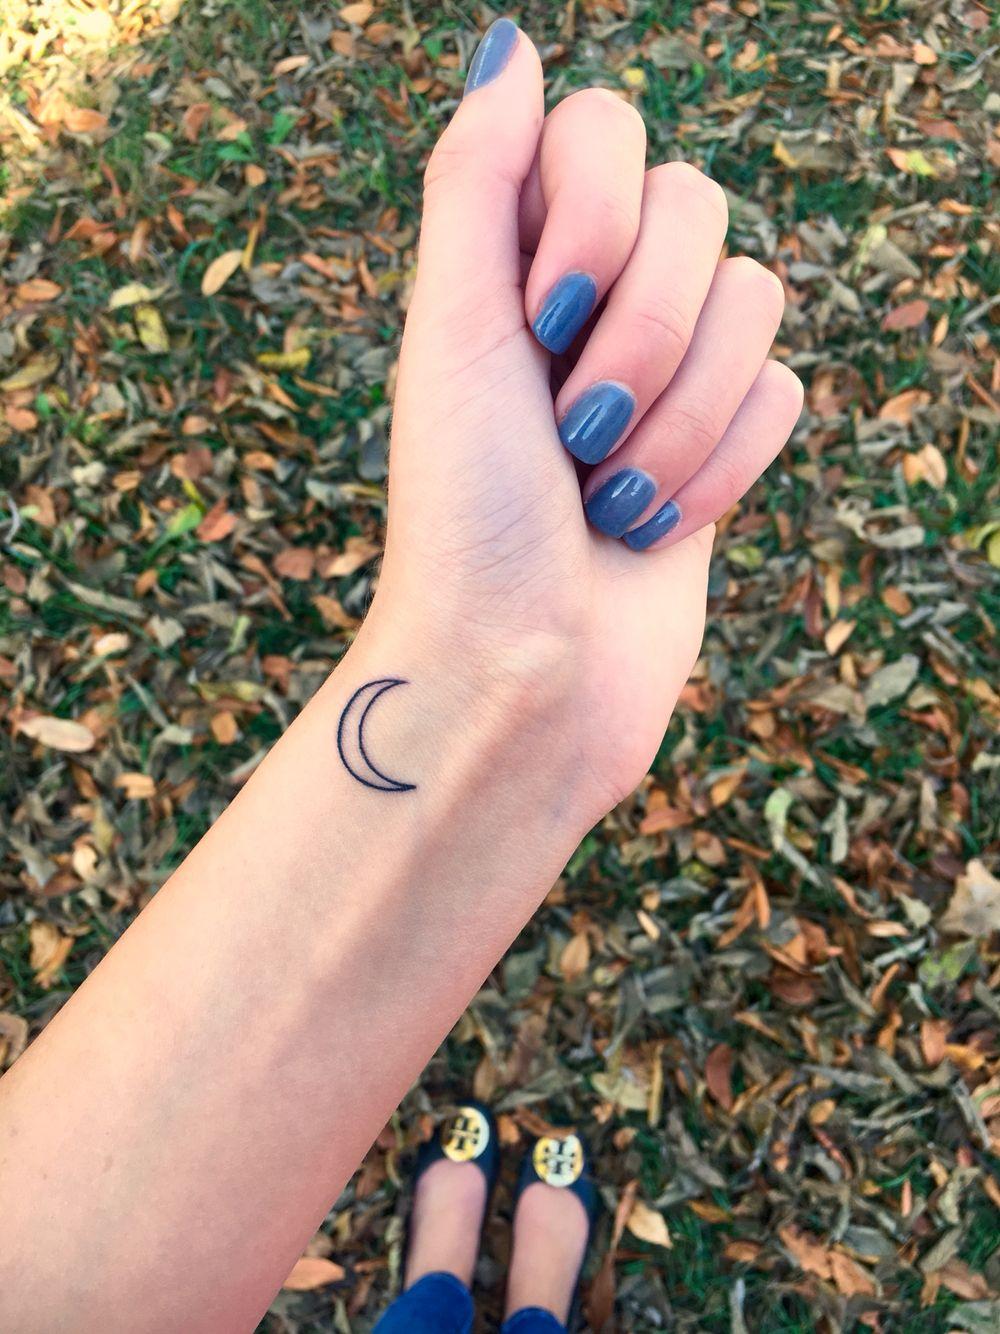 Crescent moon wrist tattoo Pequeños tatuajes de luna